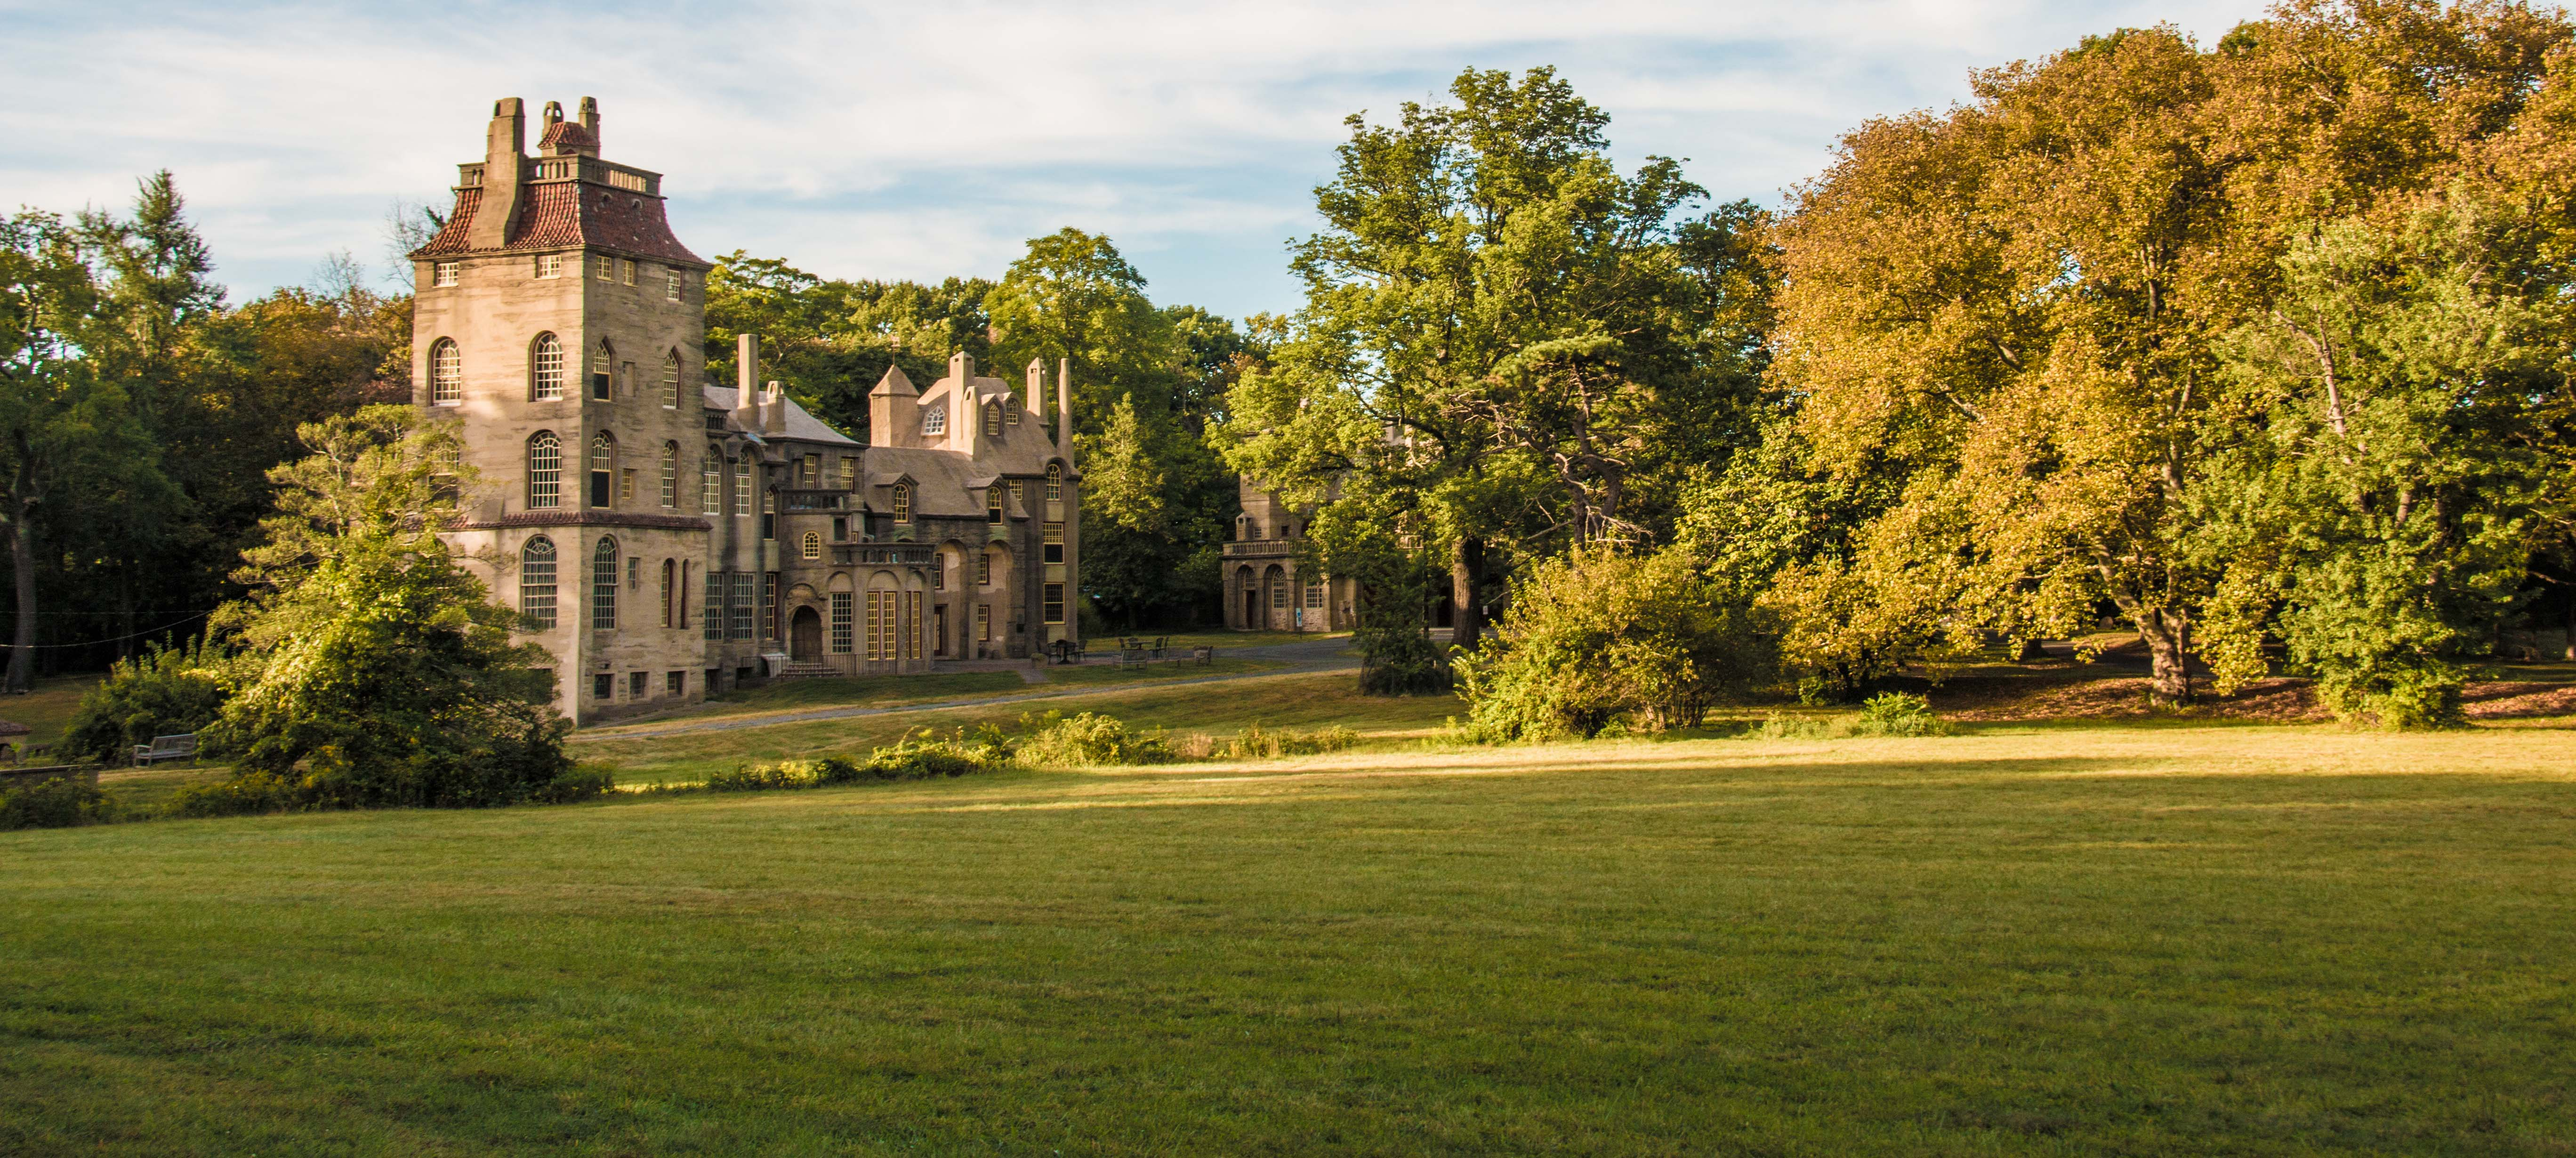 Fonthill Castle: Wedding Venues Near Doylestown Pennsylvania At Websimilar.org